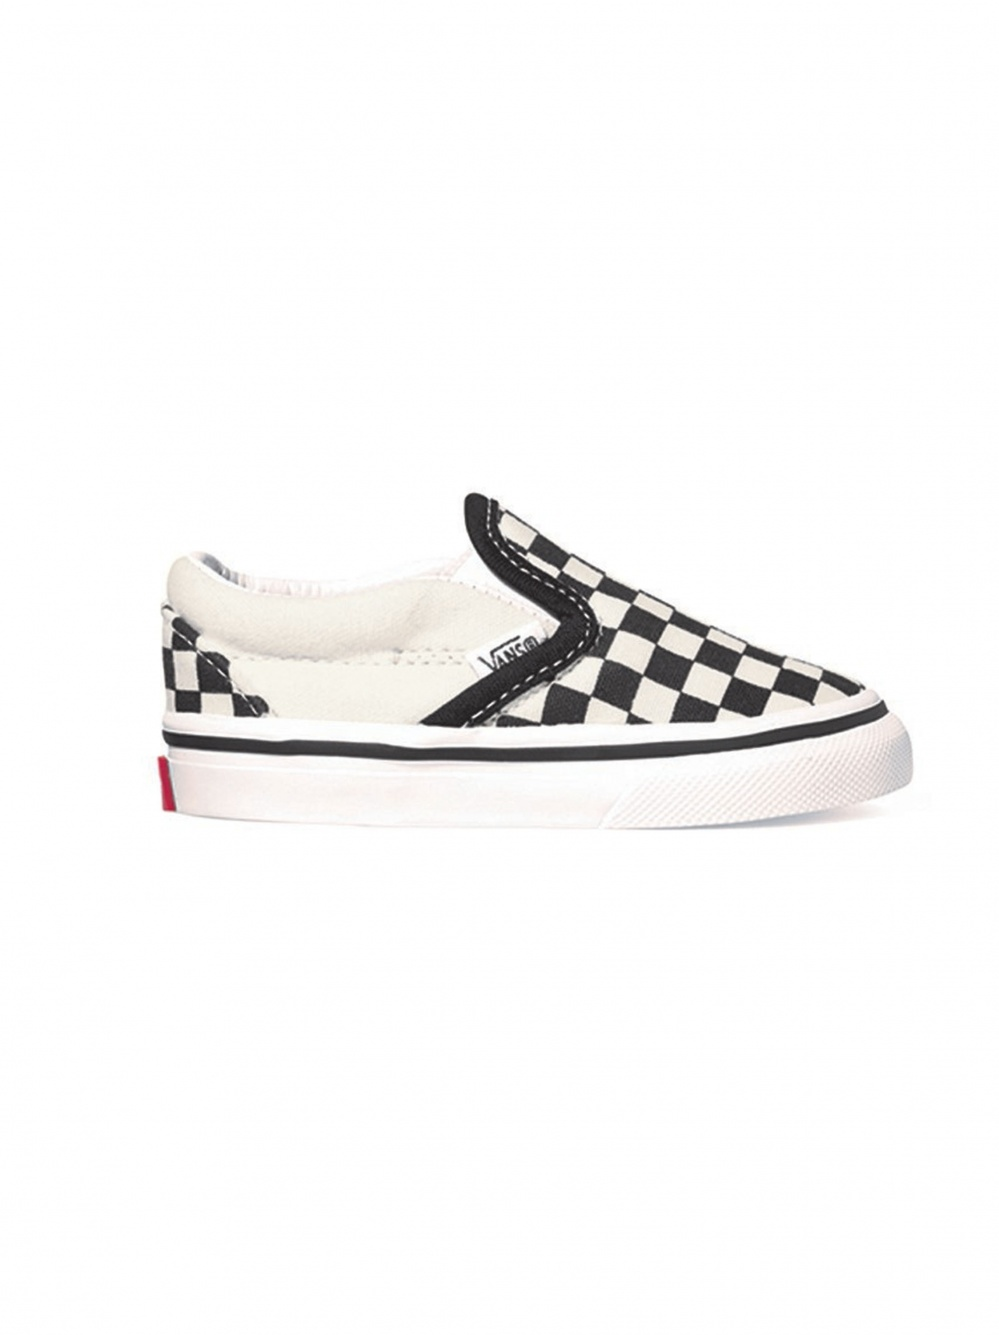 Vans Checkerboard Slip- On